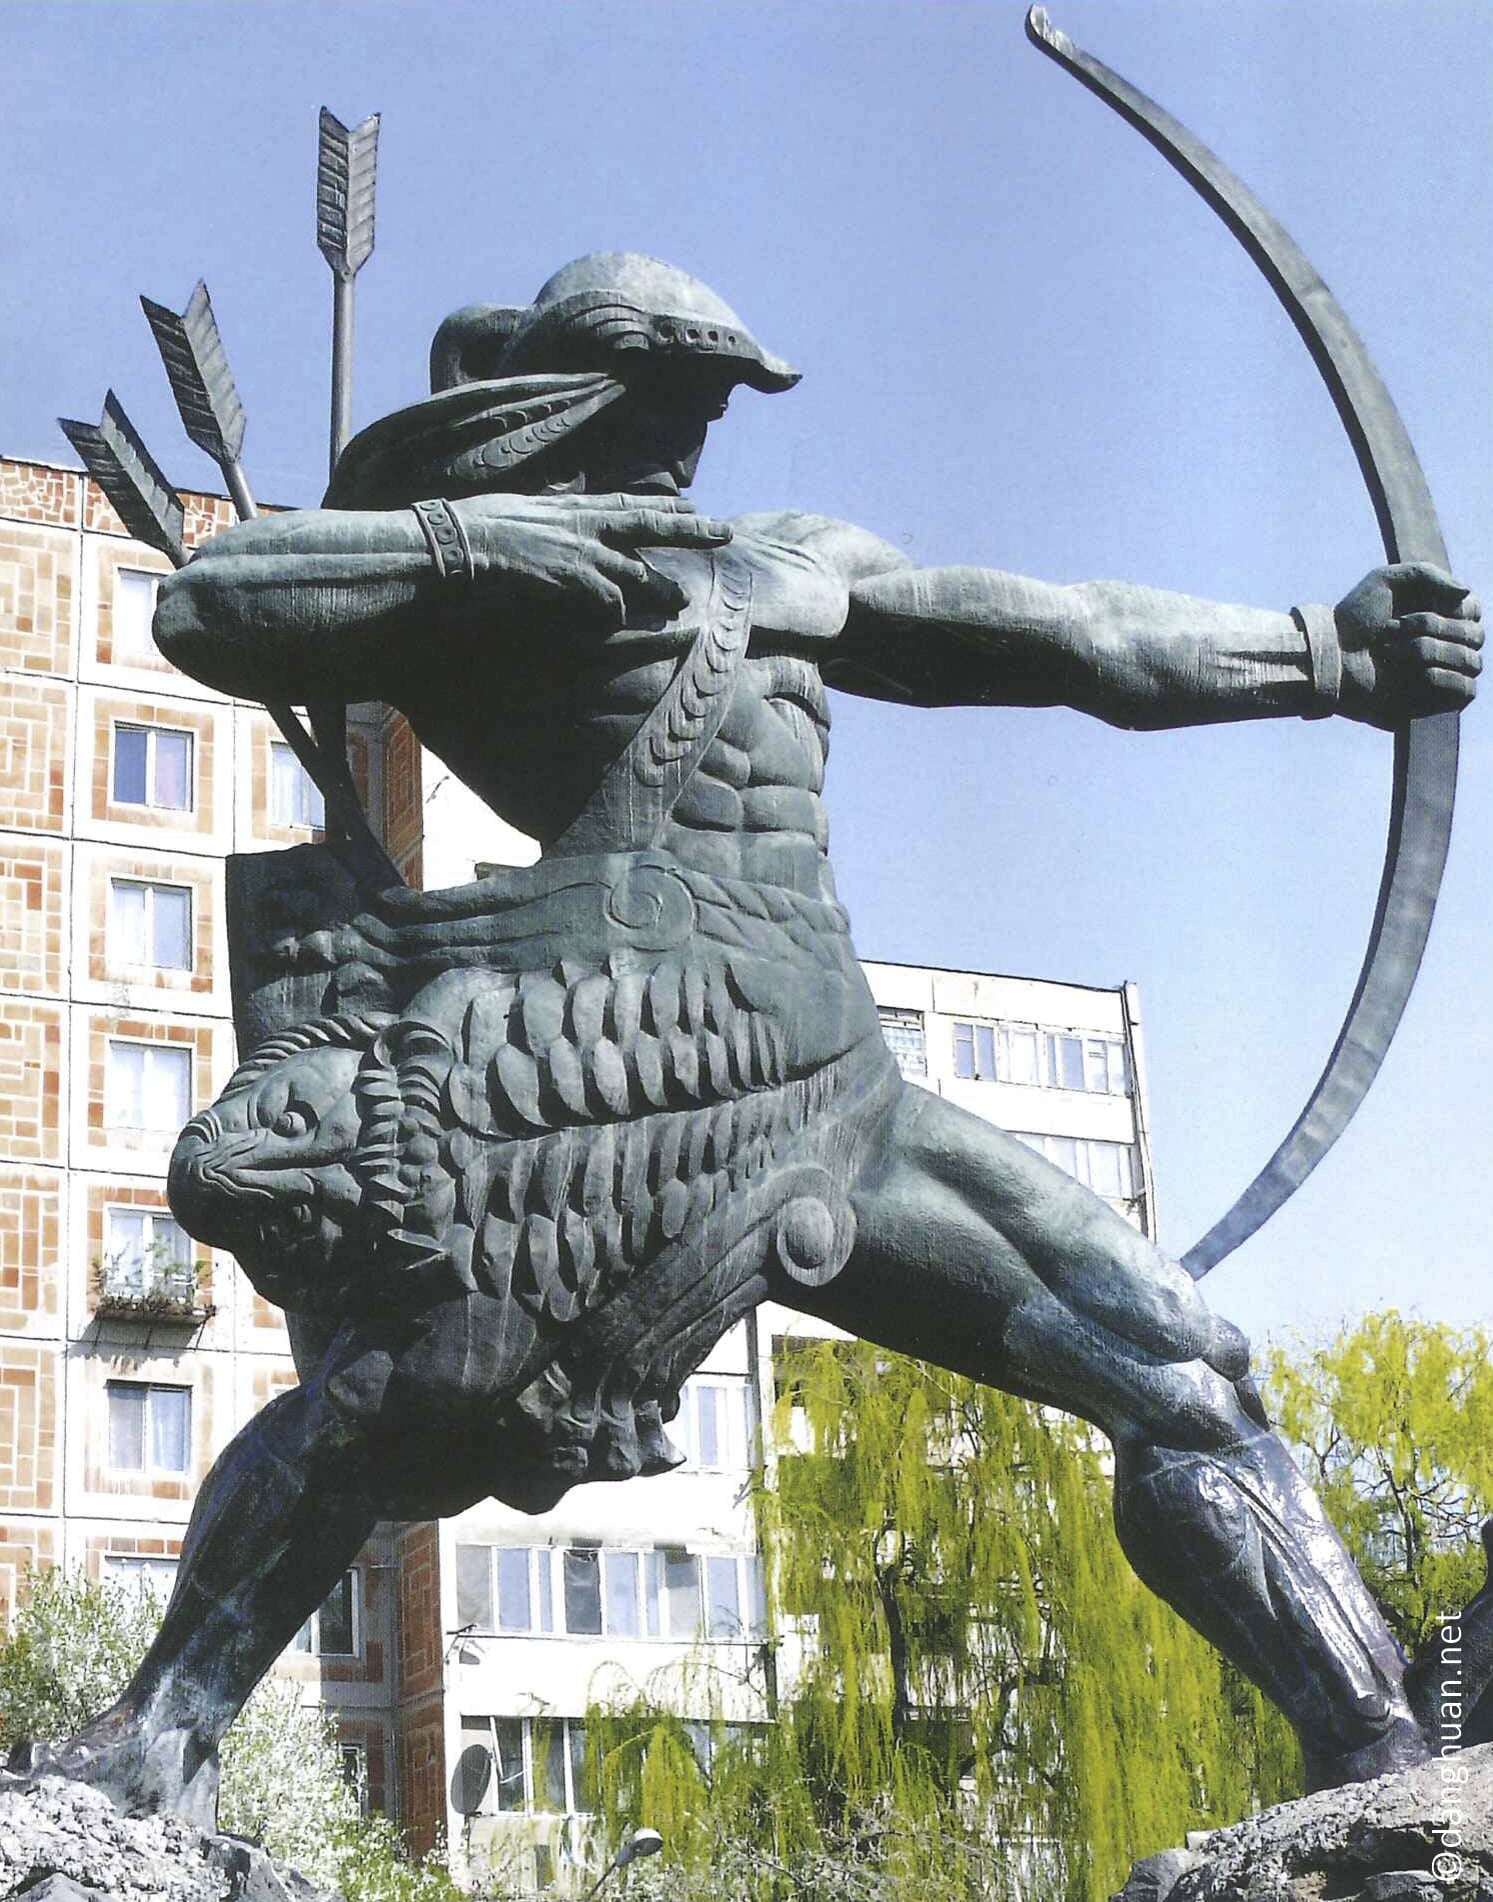 l'éponyme du nom arménien du pays Haïstan est Haïk ...